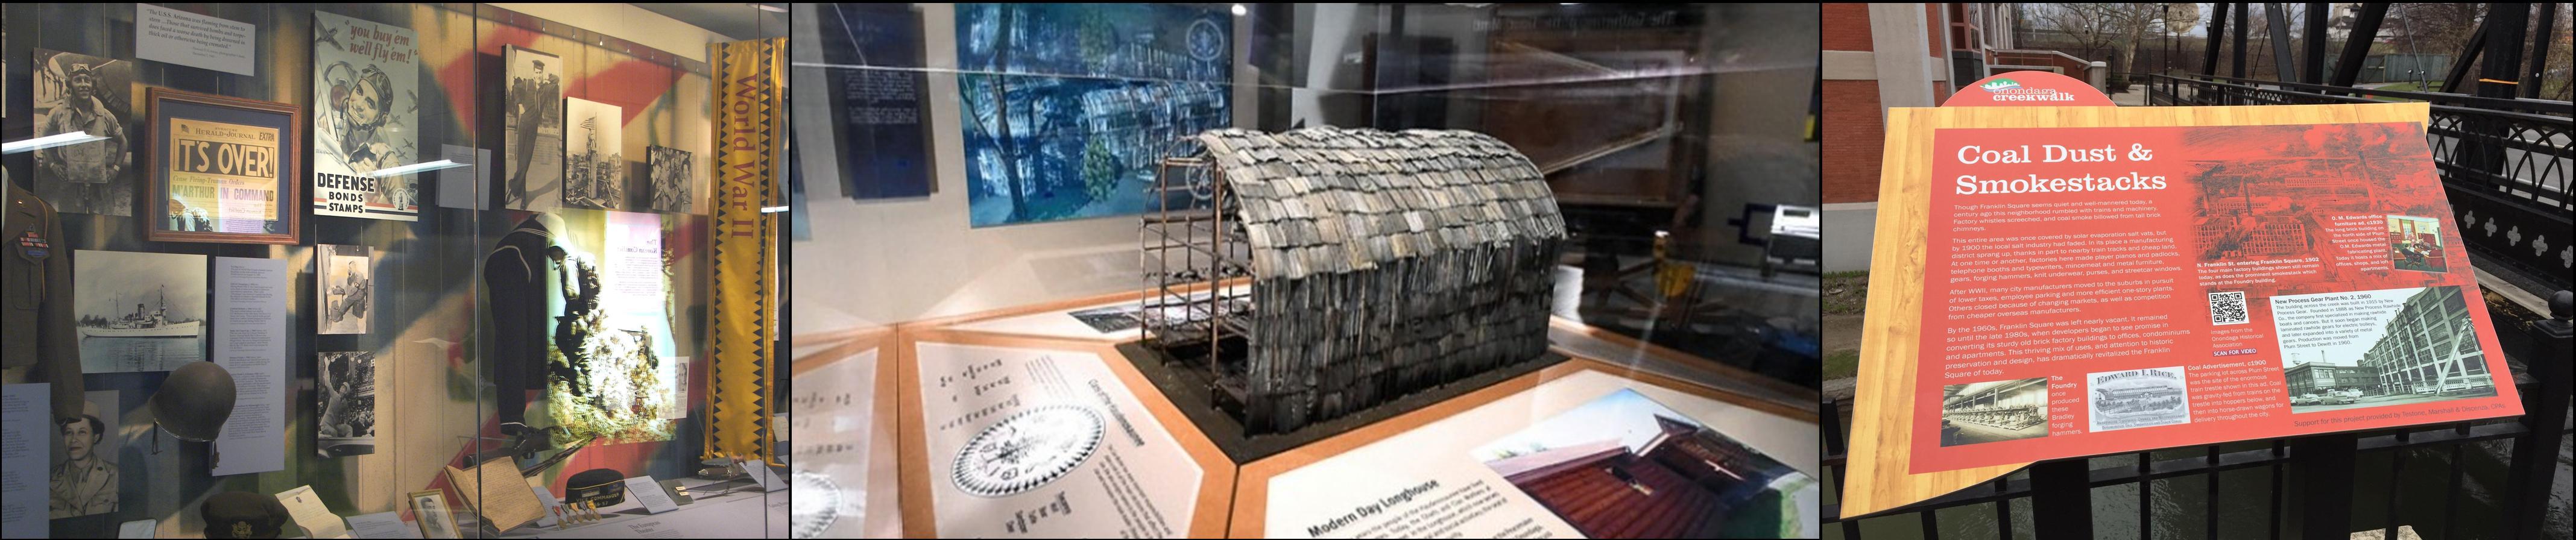 About Onondaga Historical Association (OHA)